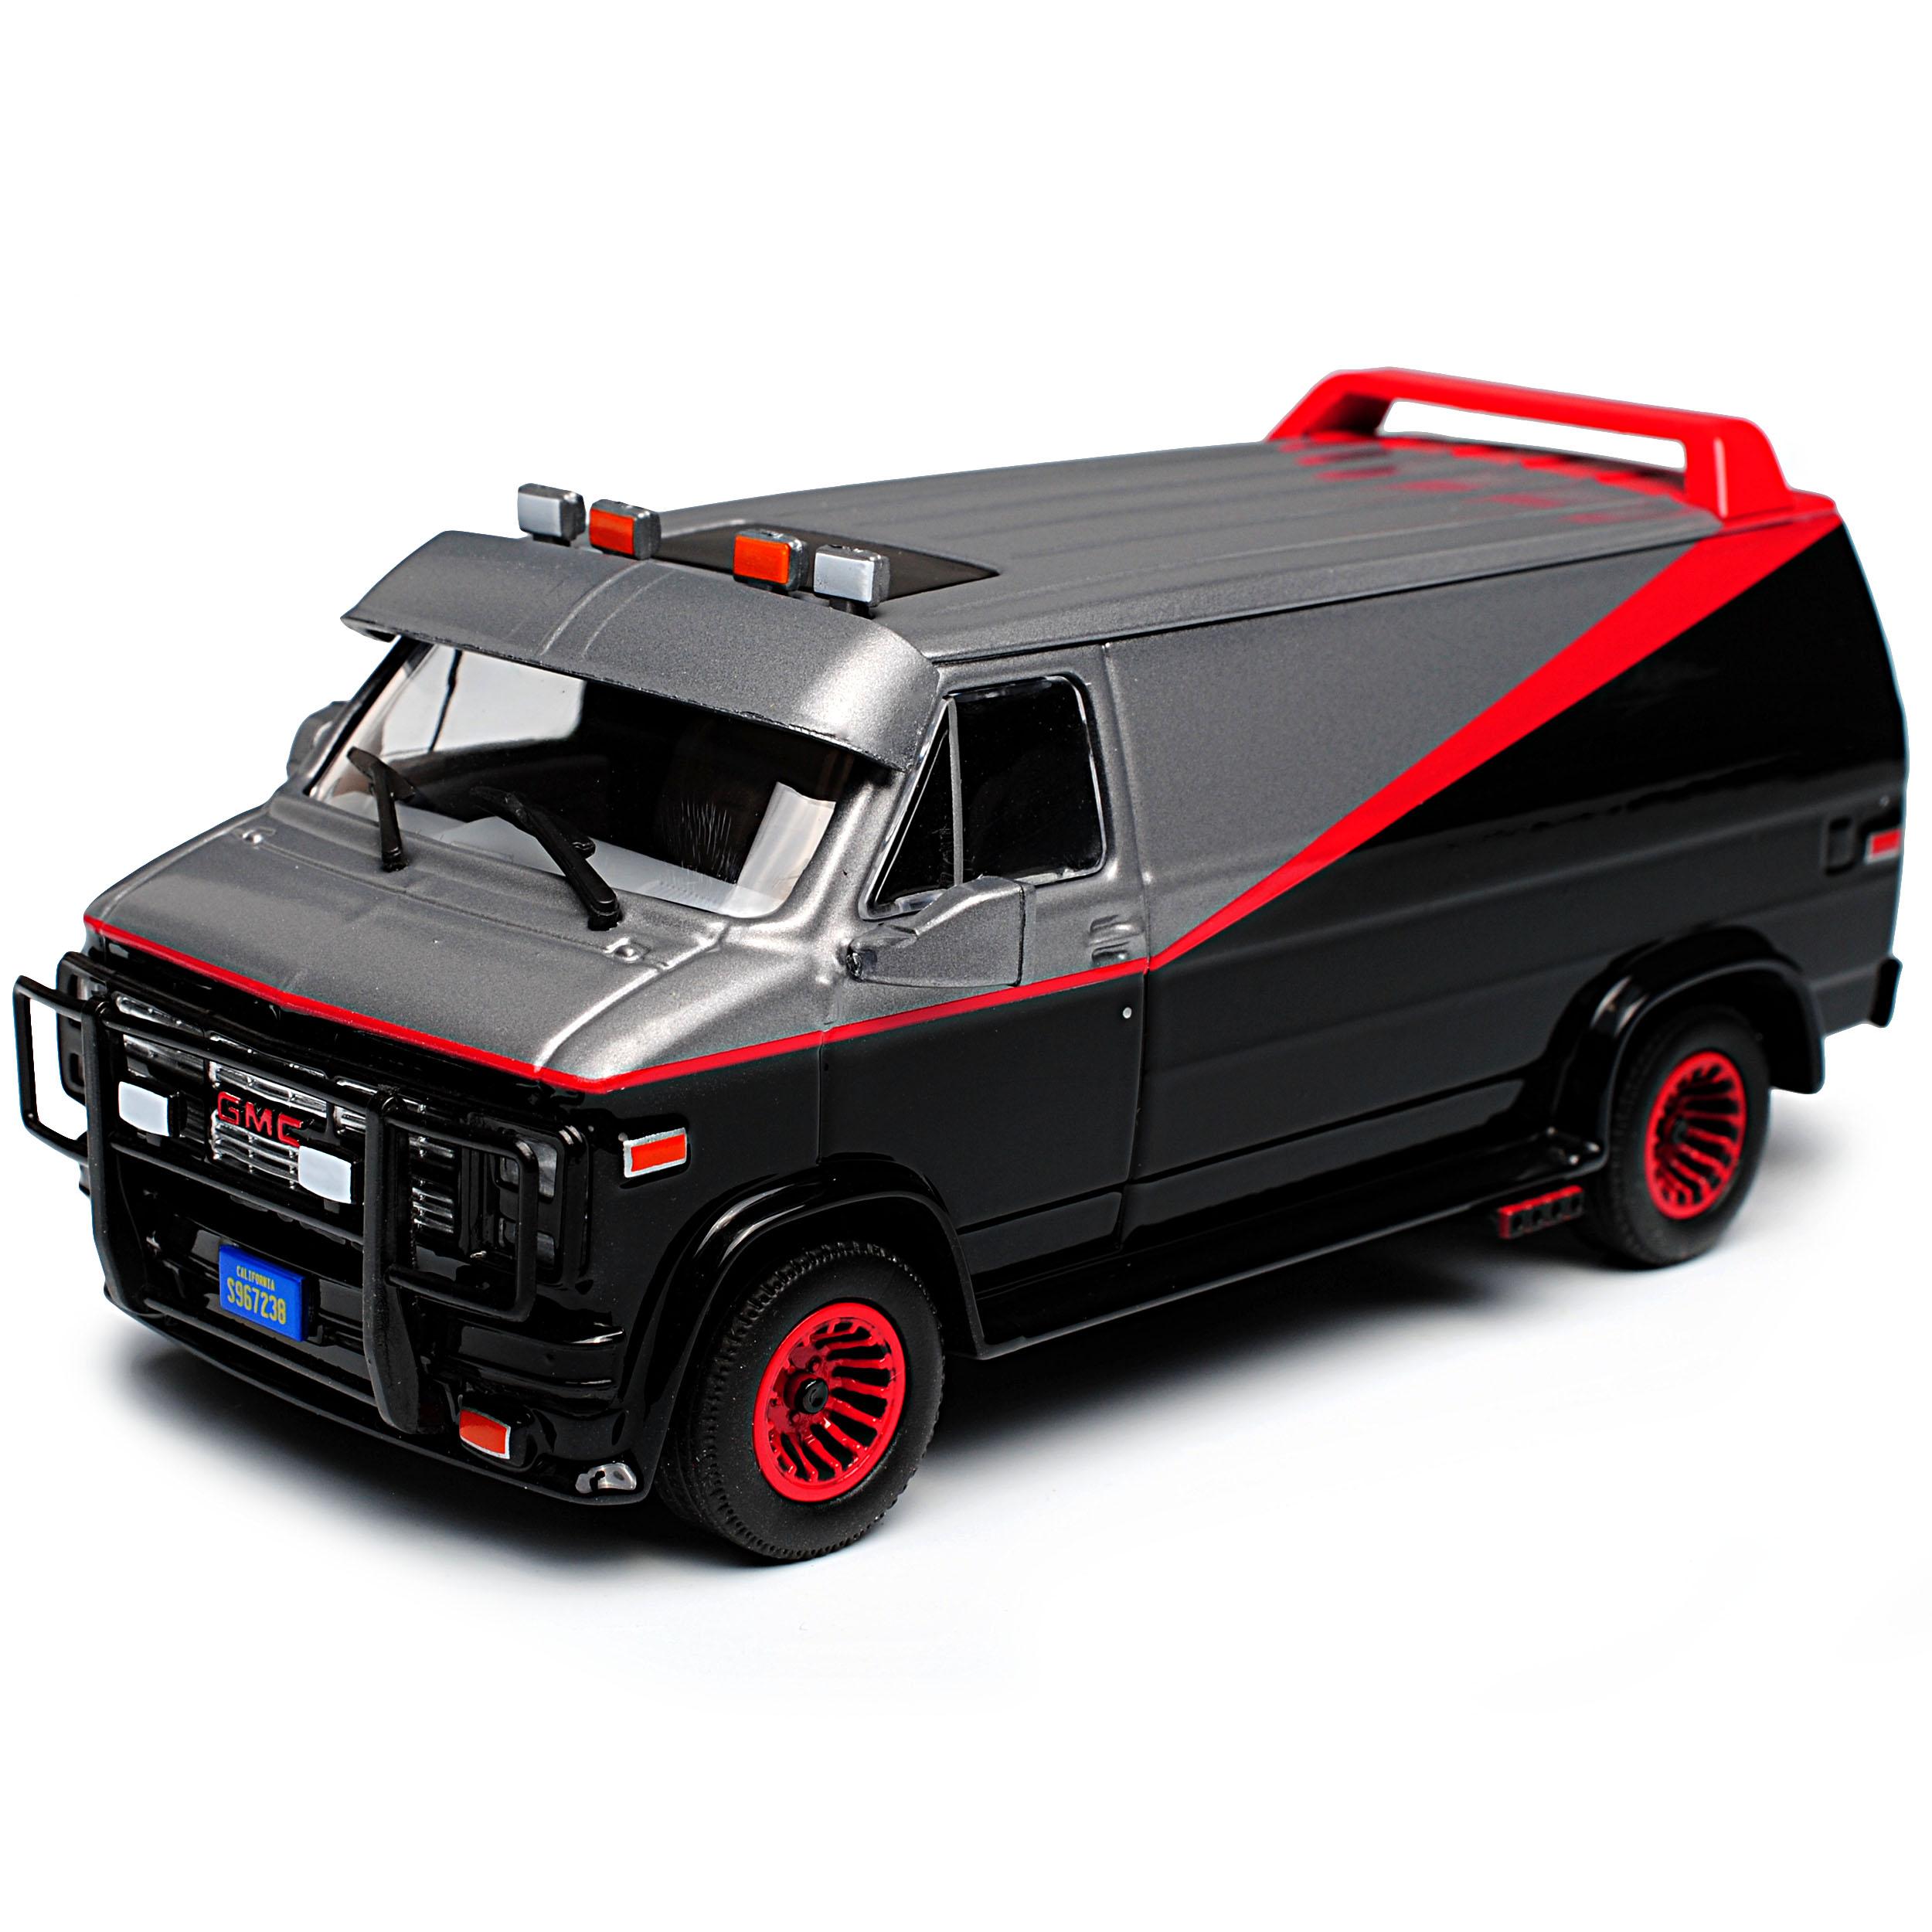 Gmc vandura the A-Team negro con rojo 1968-1996 1//43 GreenLight modelo auto M..